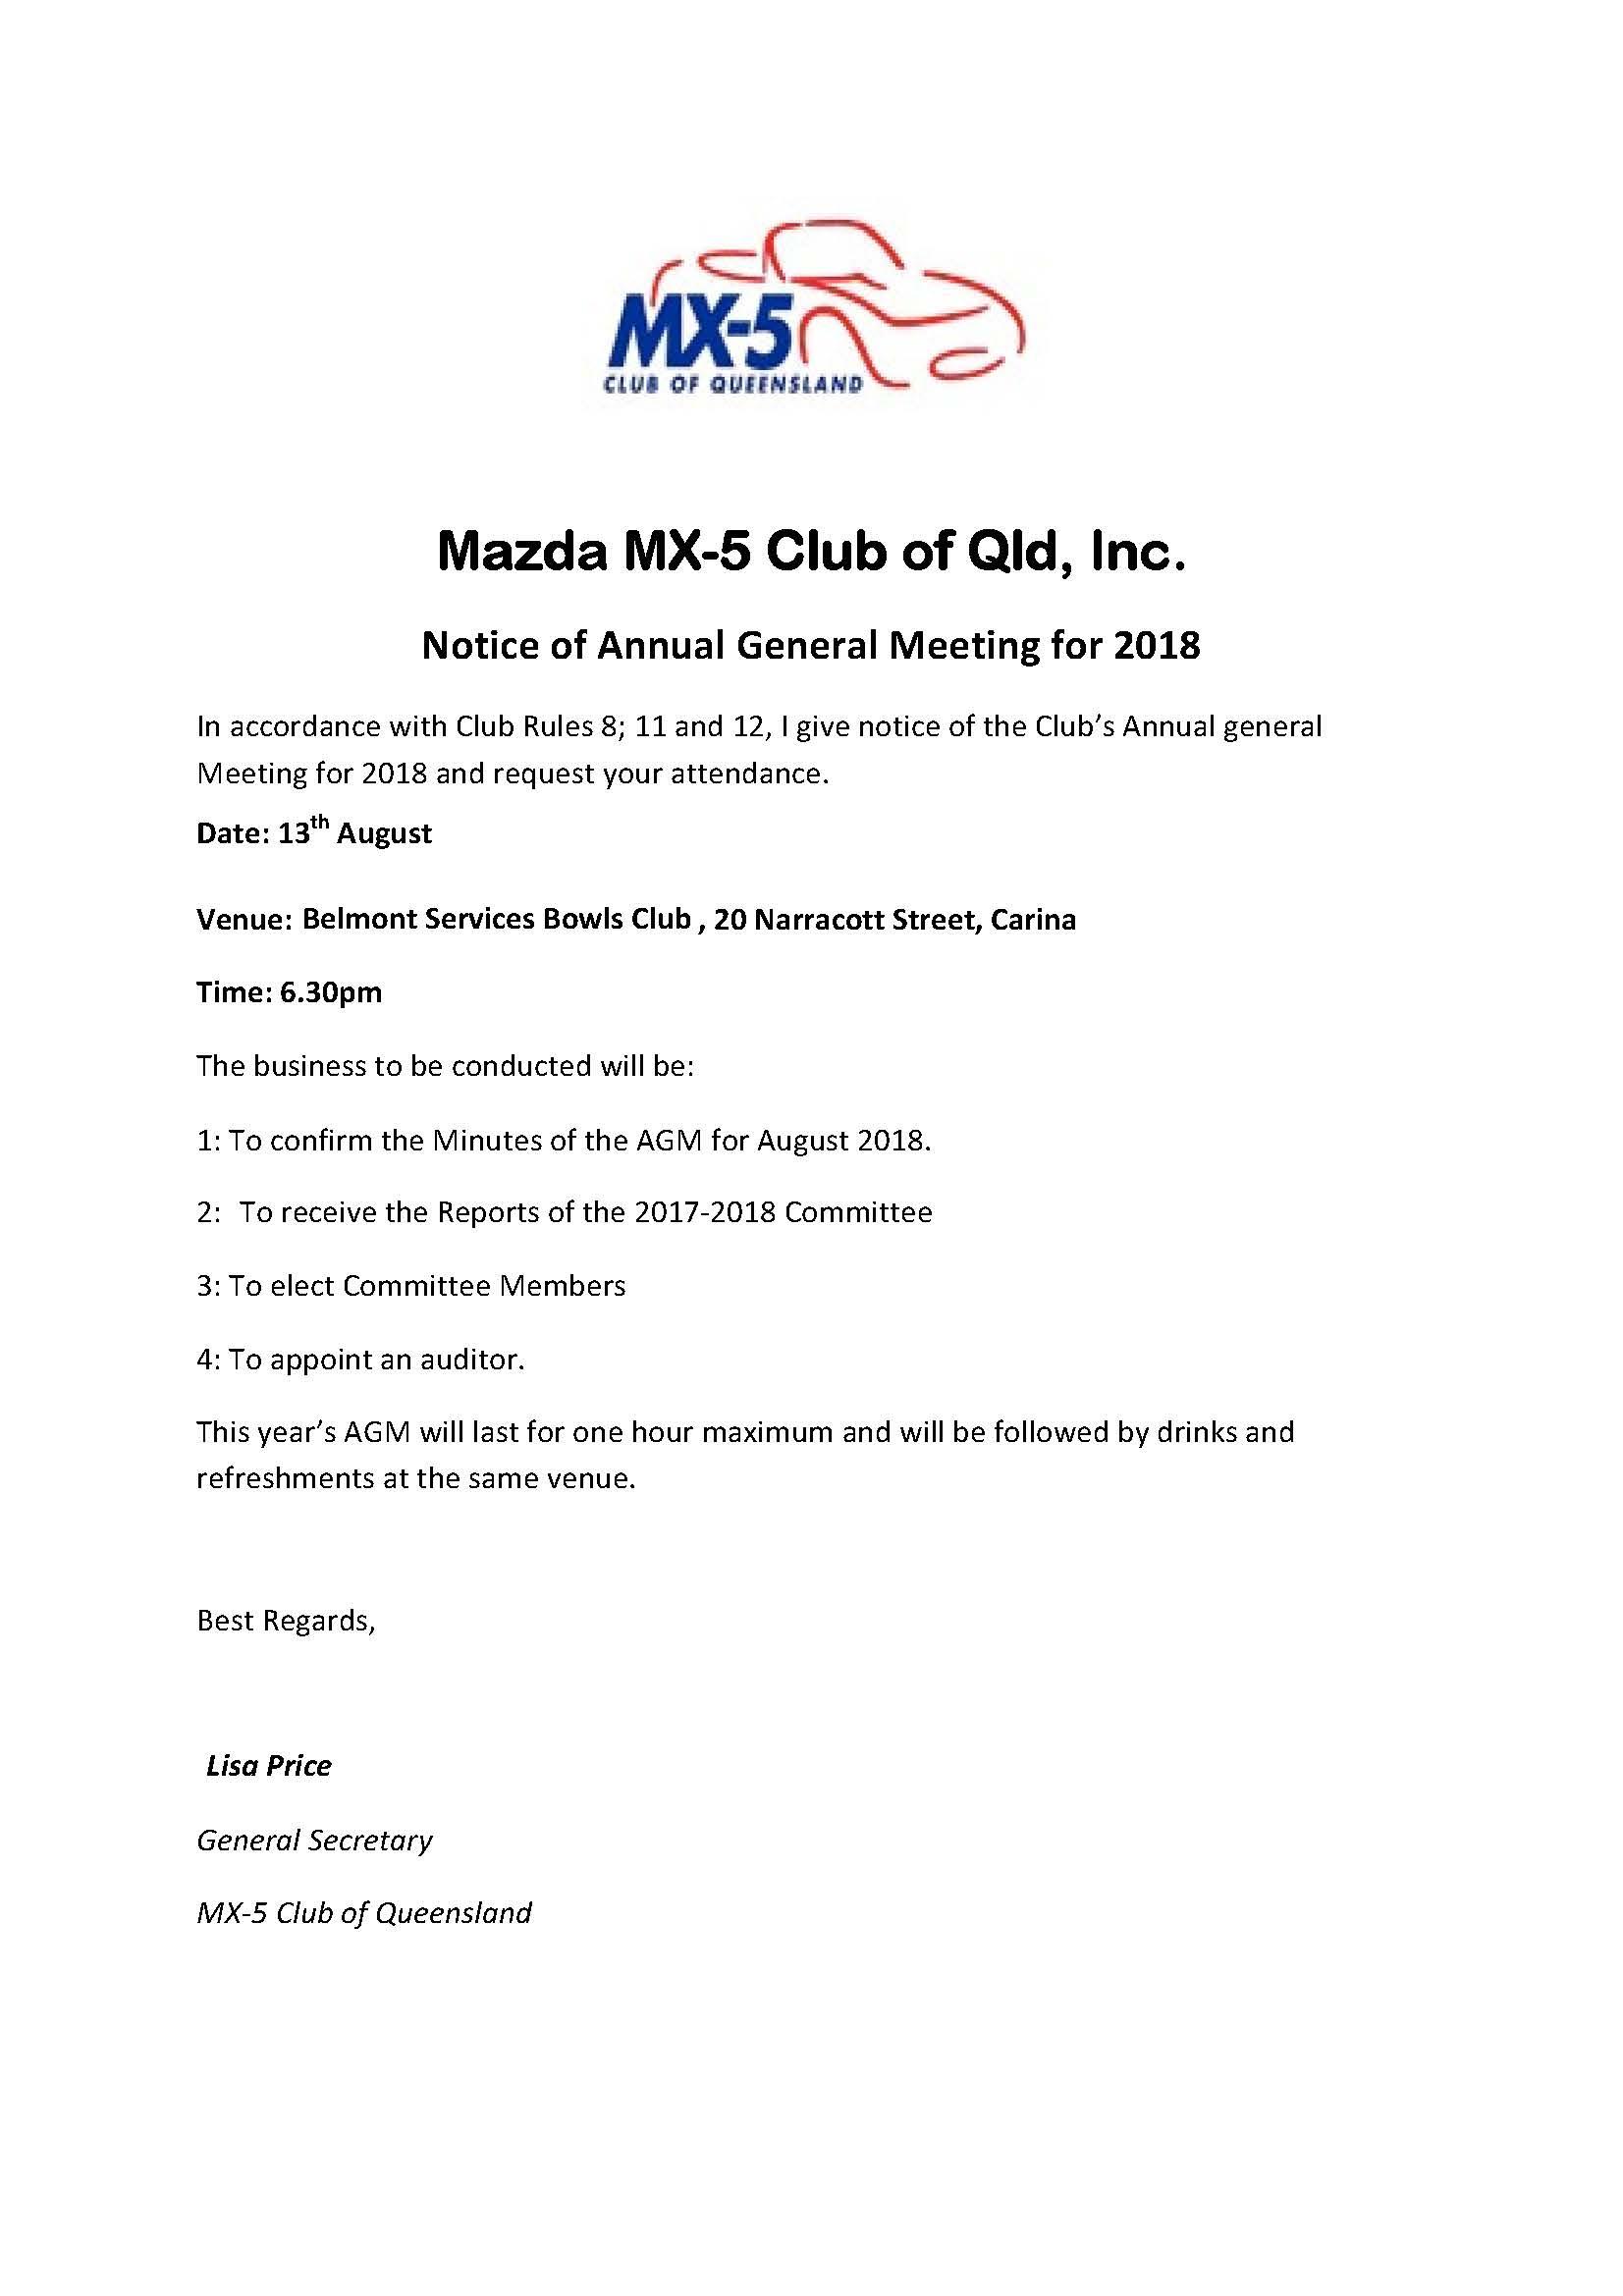 AGM Notice 2018.jpg